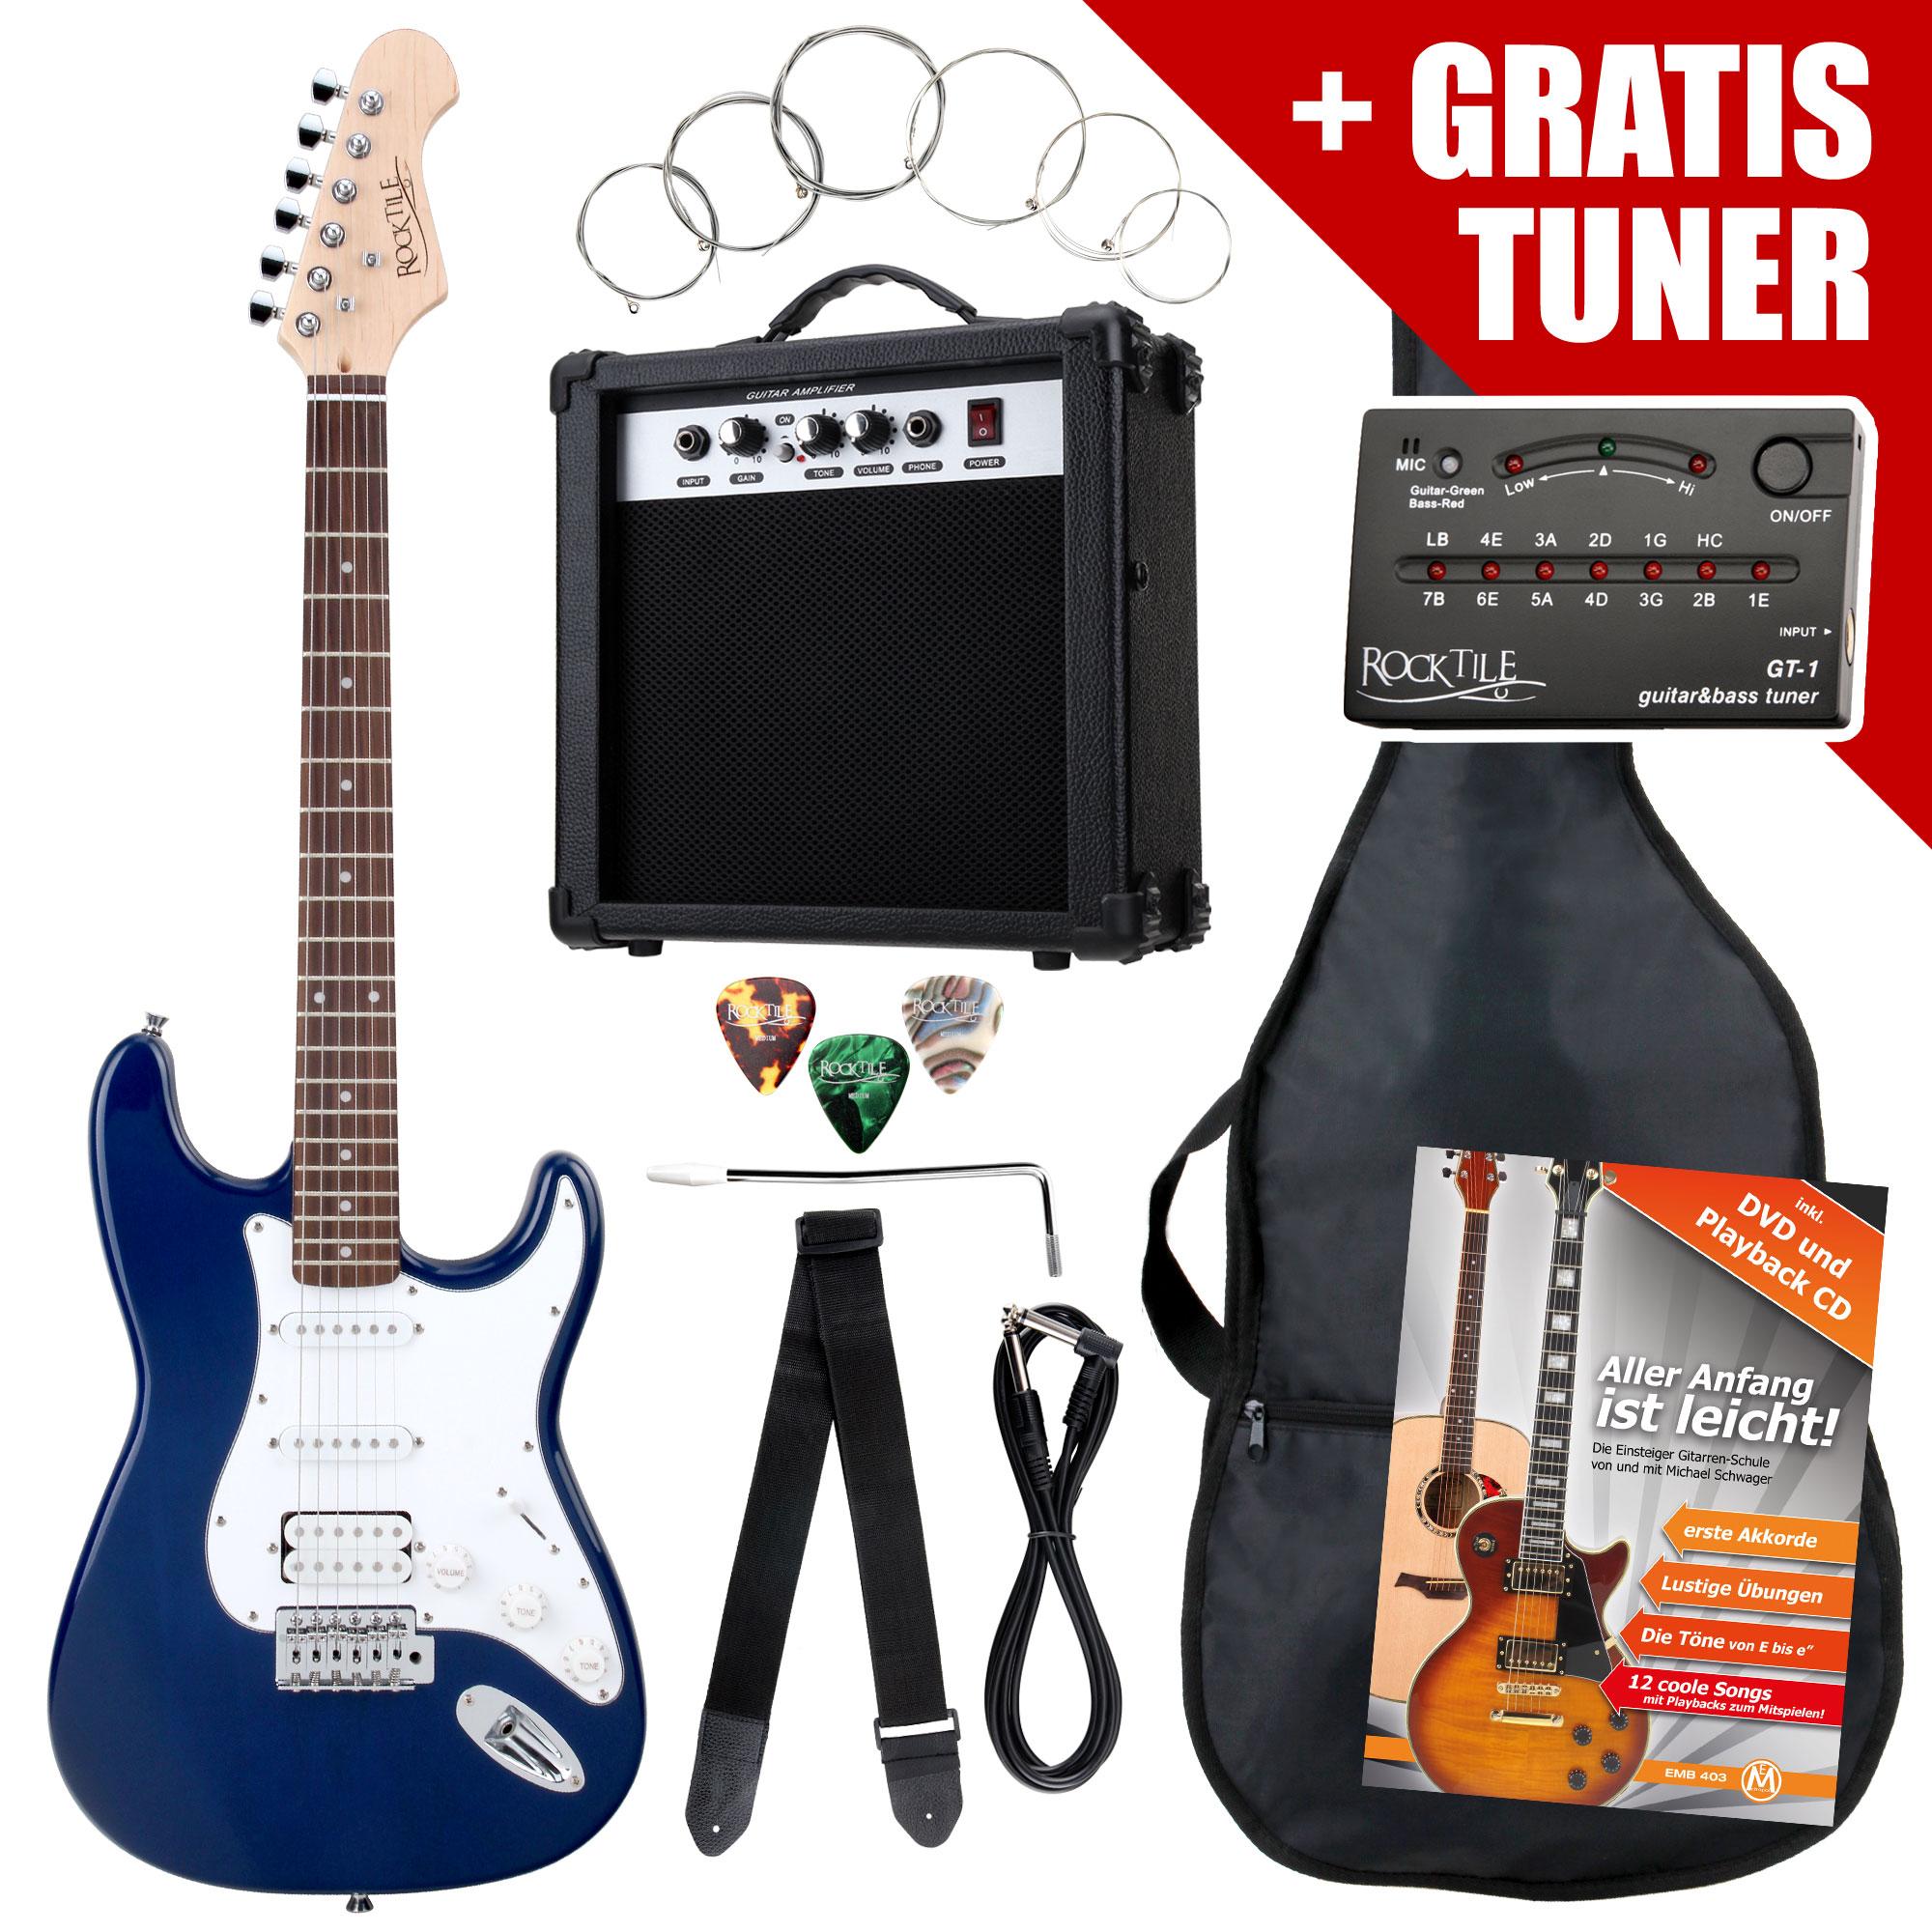 Rocktile ST PowerPack E Gitarre Set Blue inkl. Verstärker, Tasche, Stimmgerät, Kabel, Gurt, Saiten und Schule inkl. CD|DVD